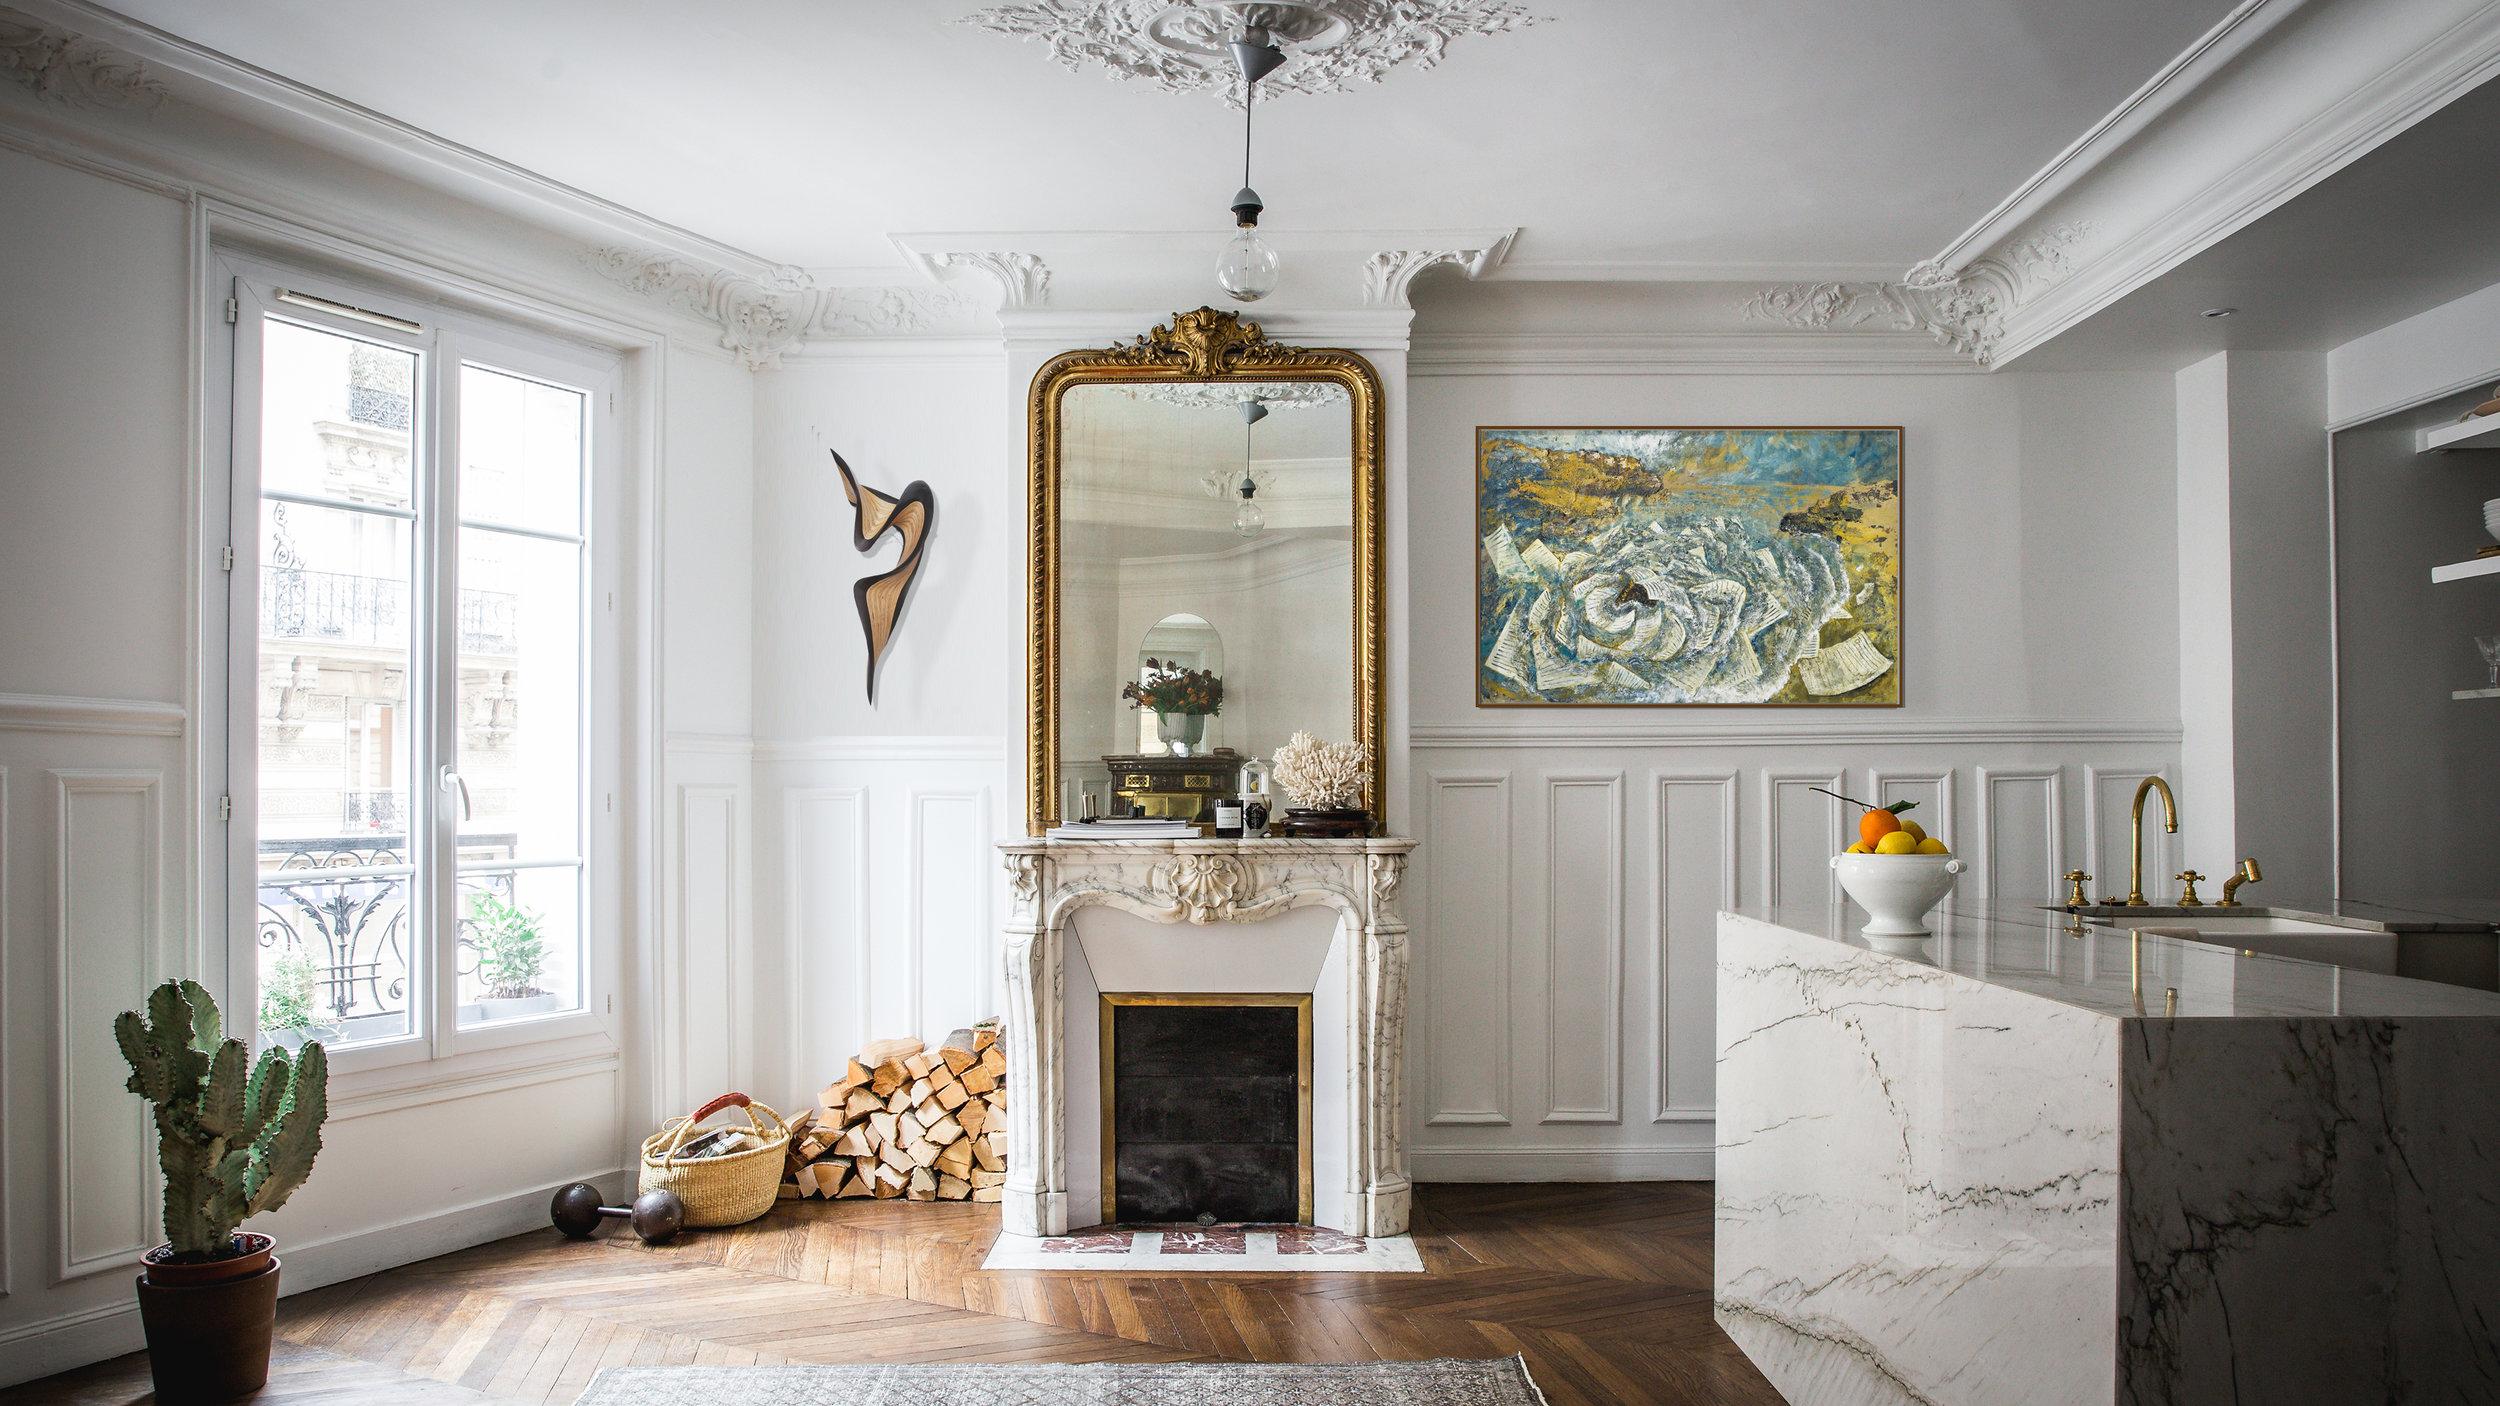 House_Calls_Pai_Ellis_Paris_living_fireplace.1543847412.jpg